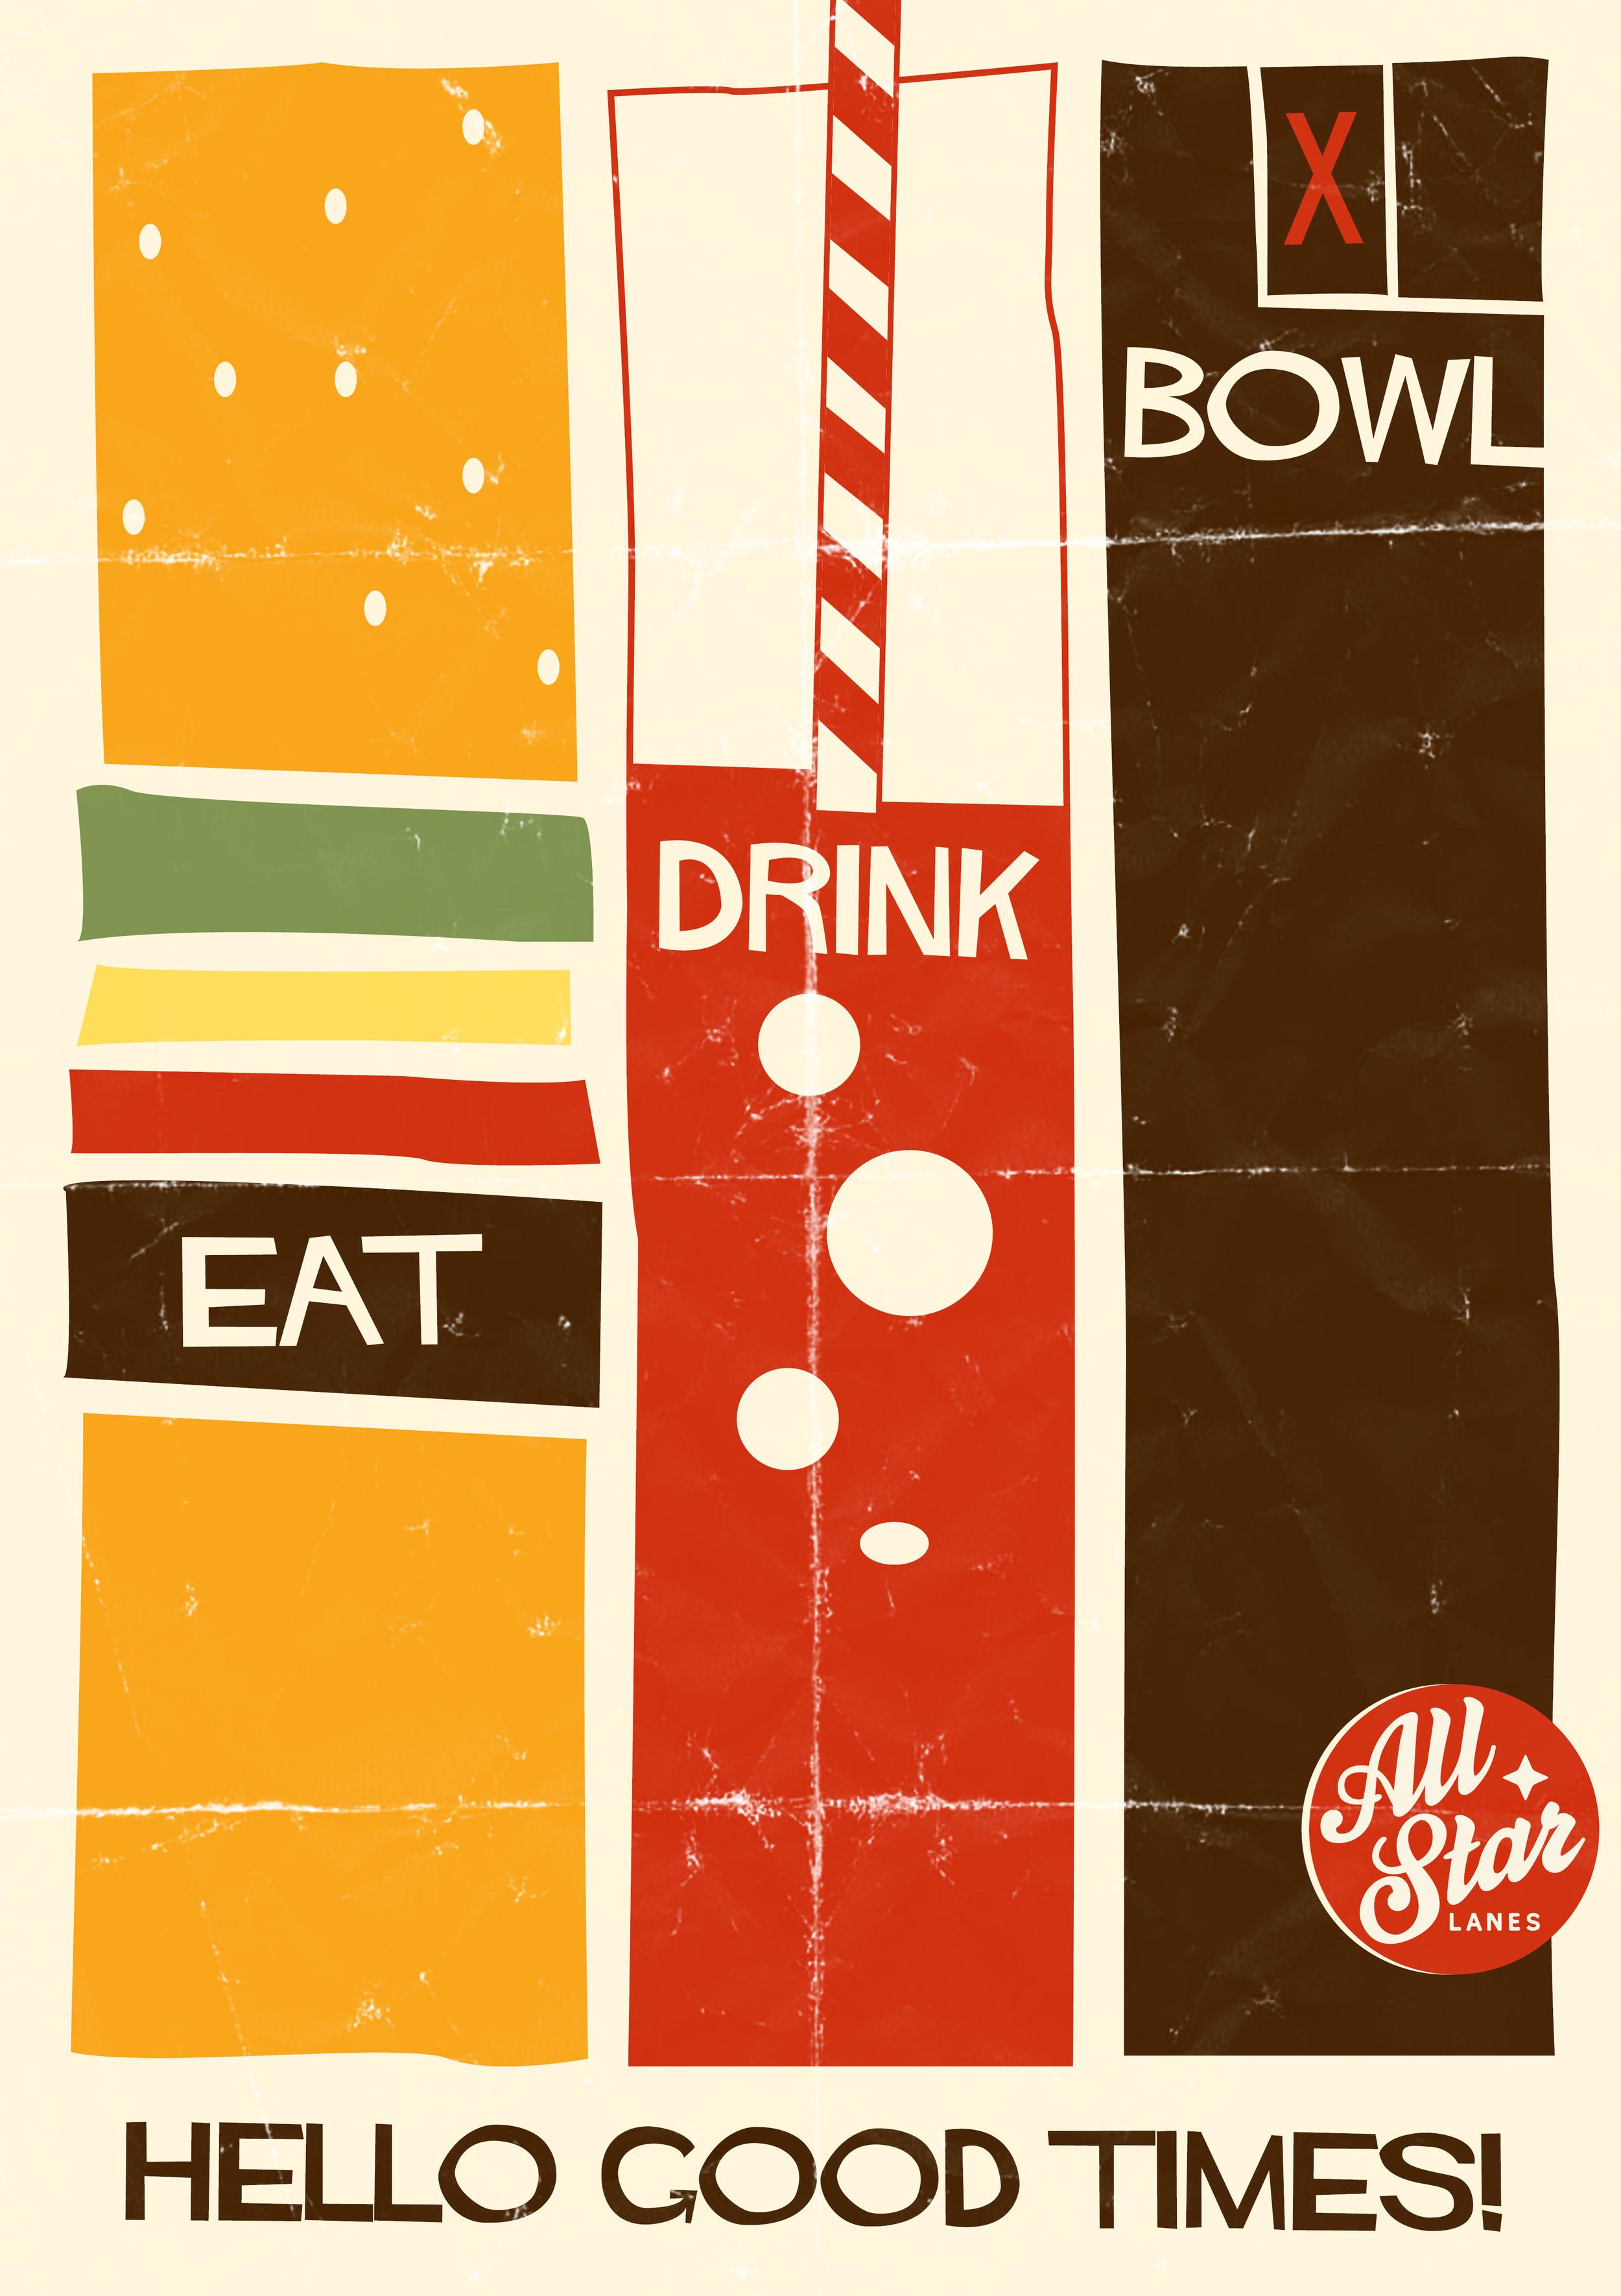 121030_Eat Drink Bowl Poster 6.jpg